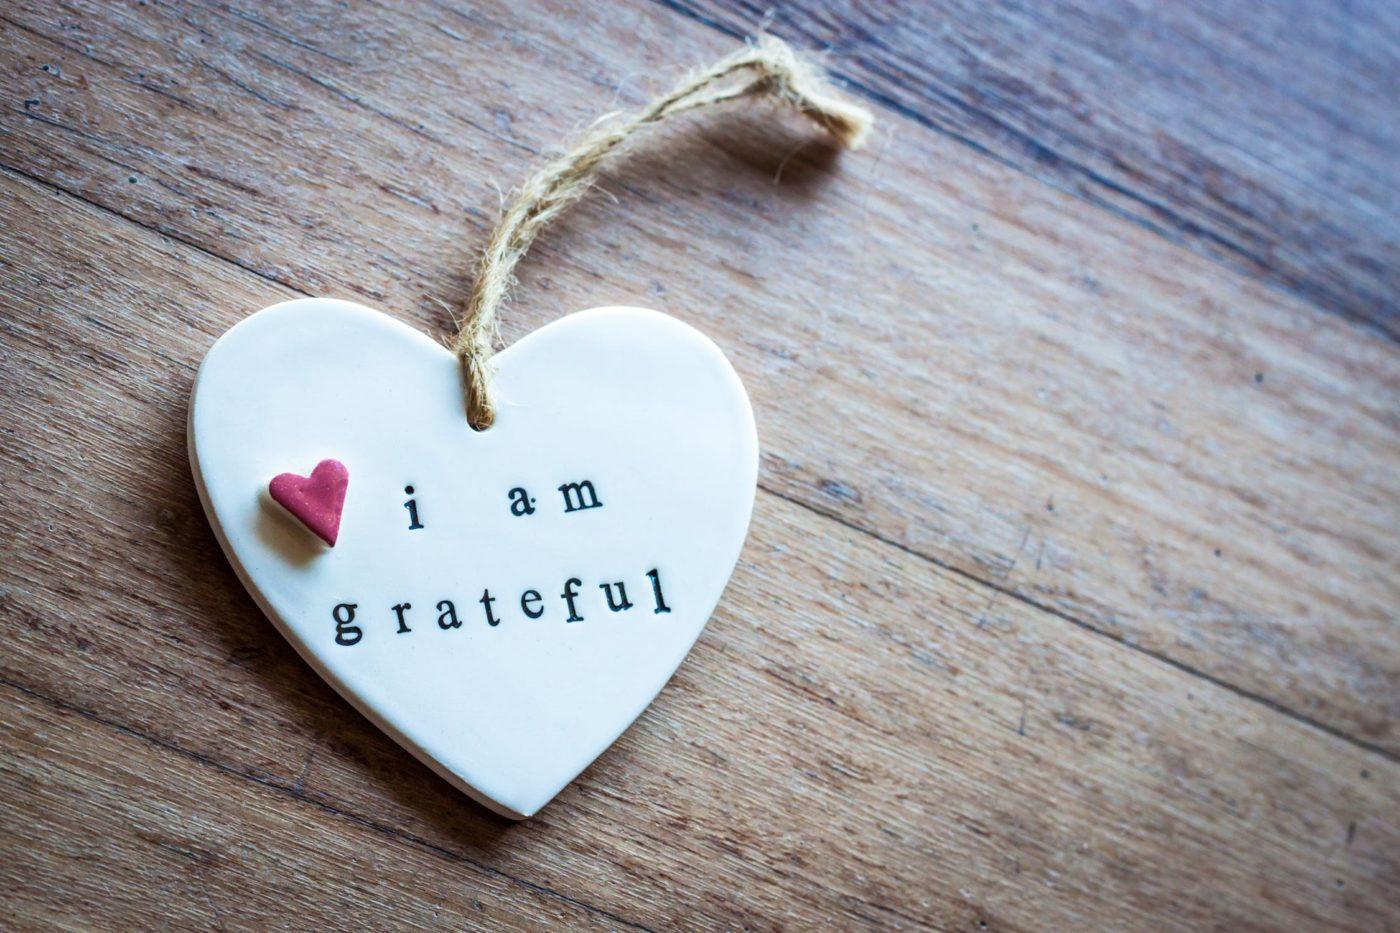 i am grateful keychain